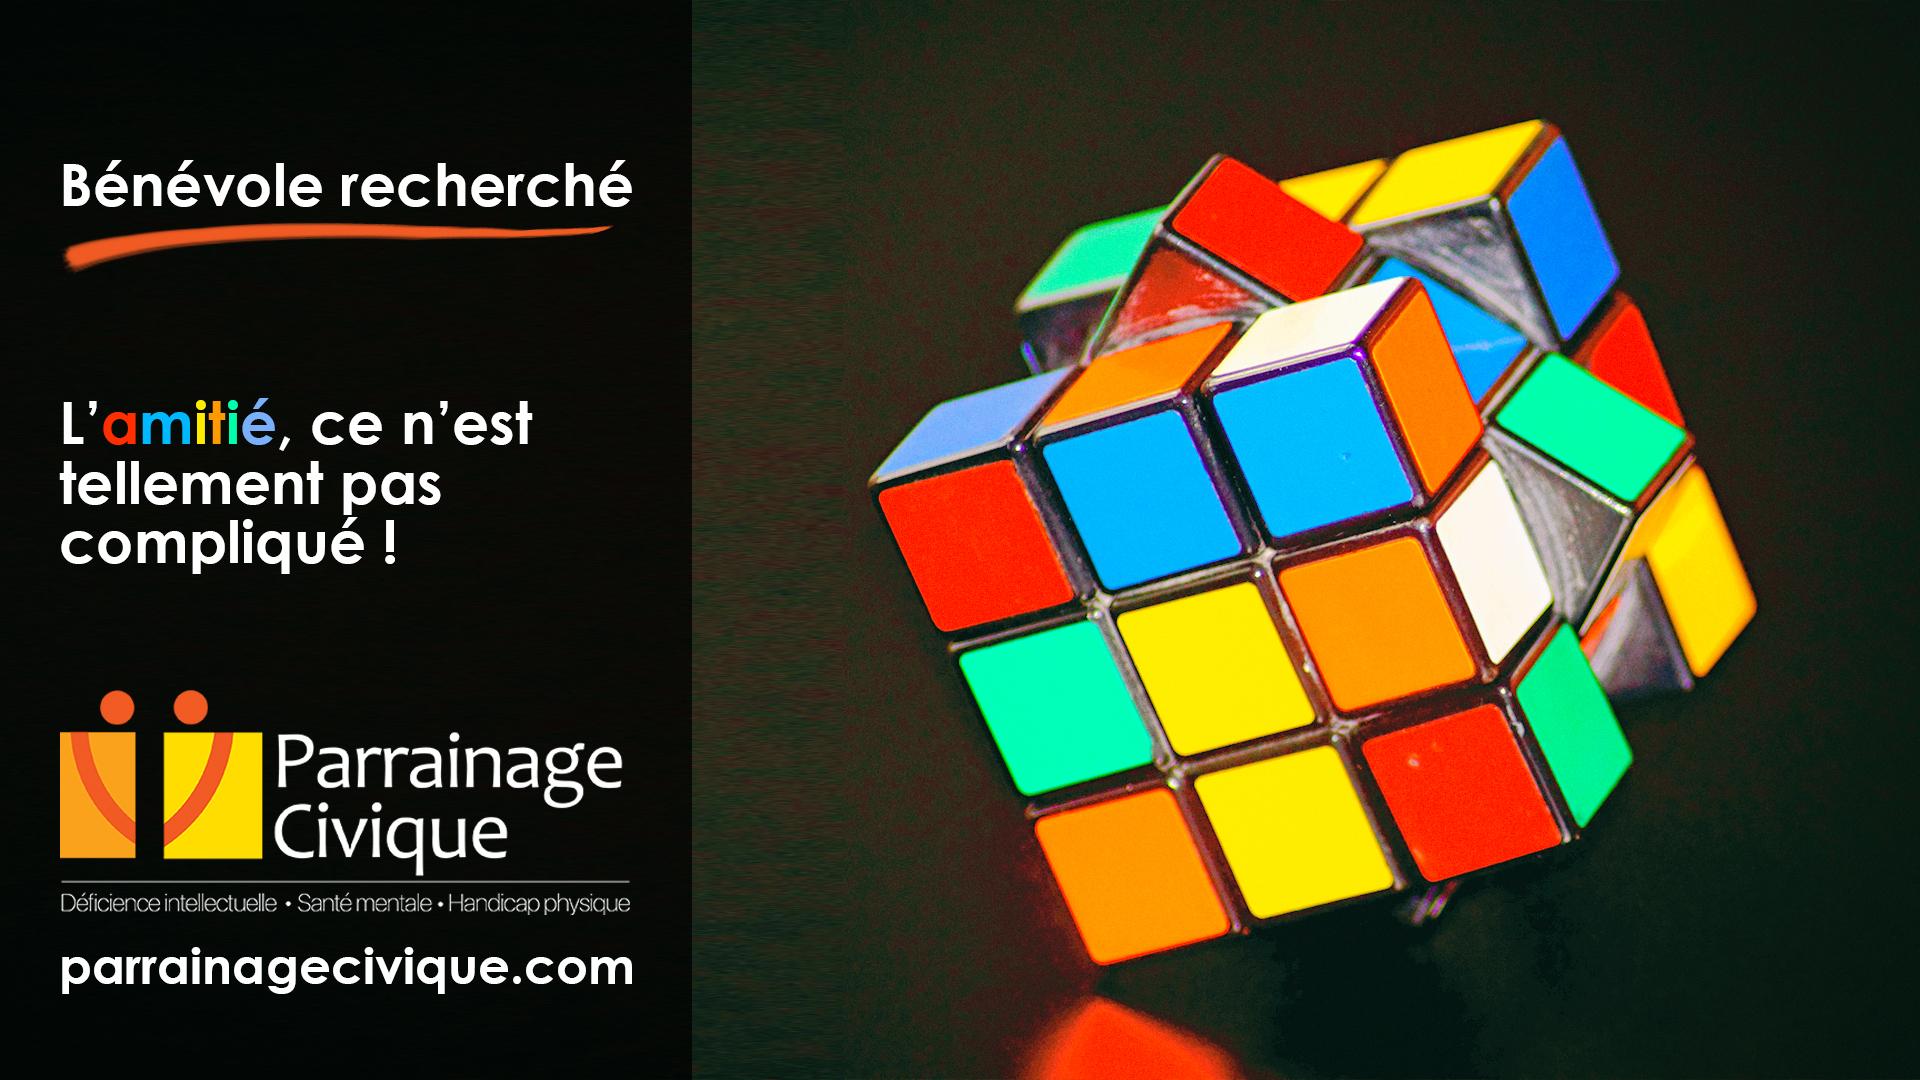 Benevole-recherche-02